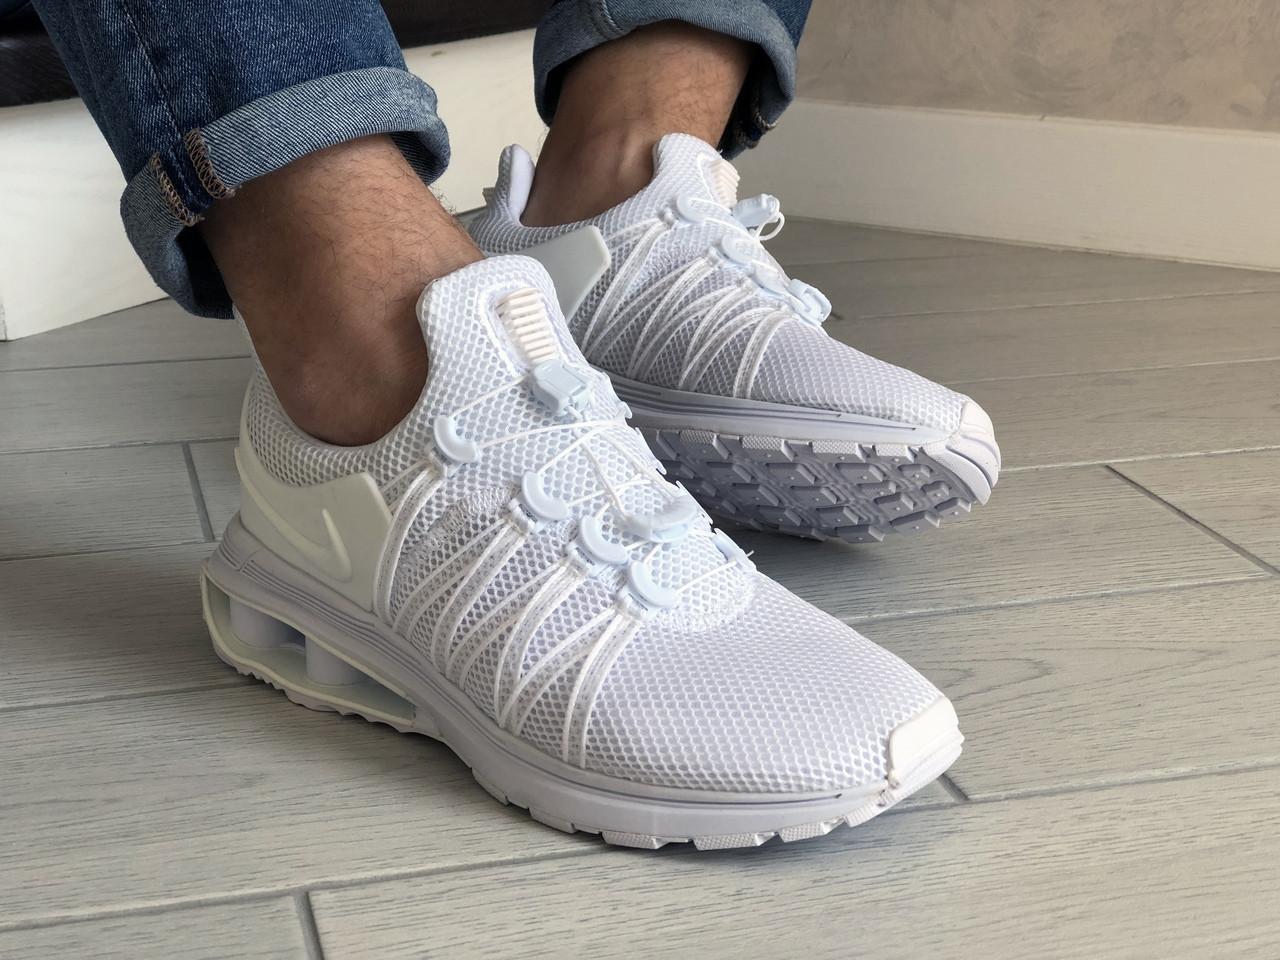 Мужские кроссовки Nike Shox Gravity (белые) 9301